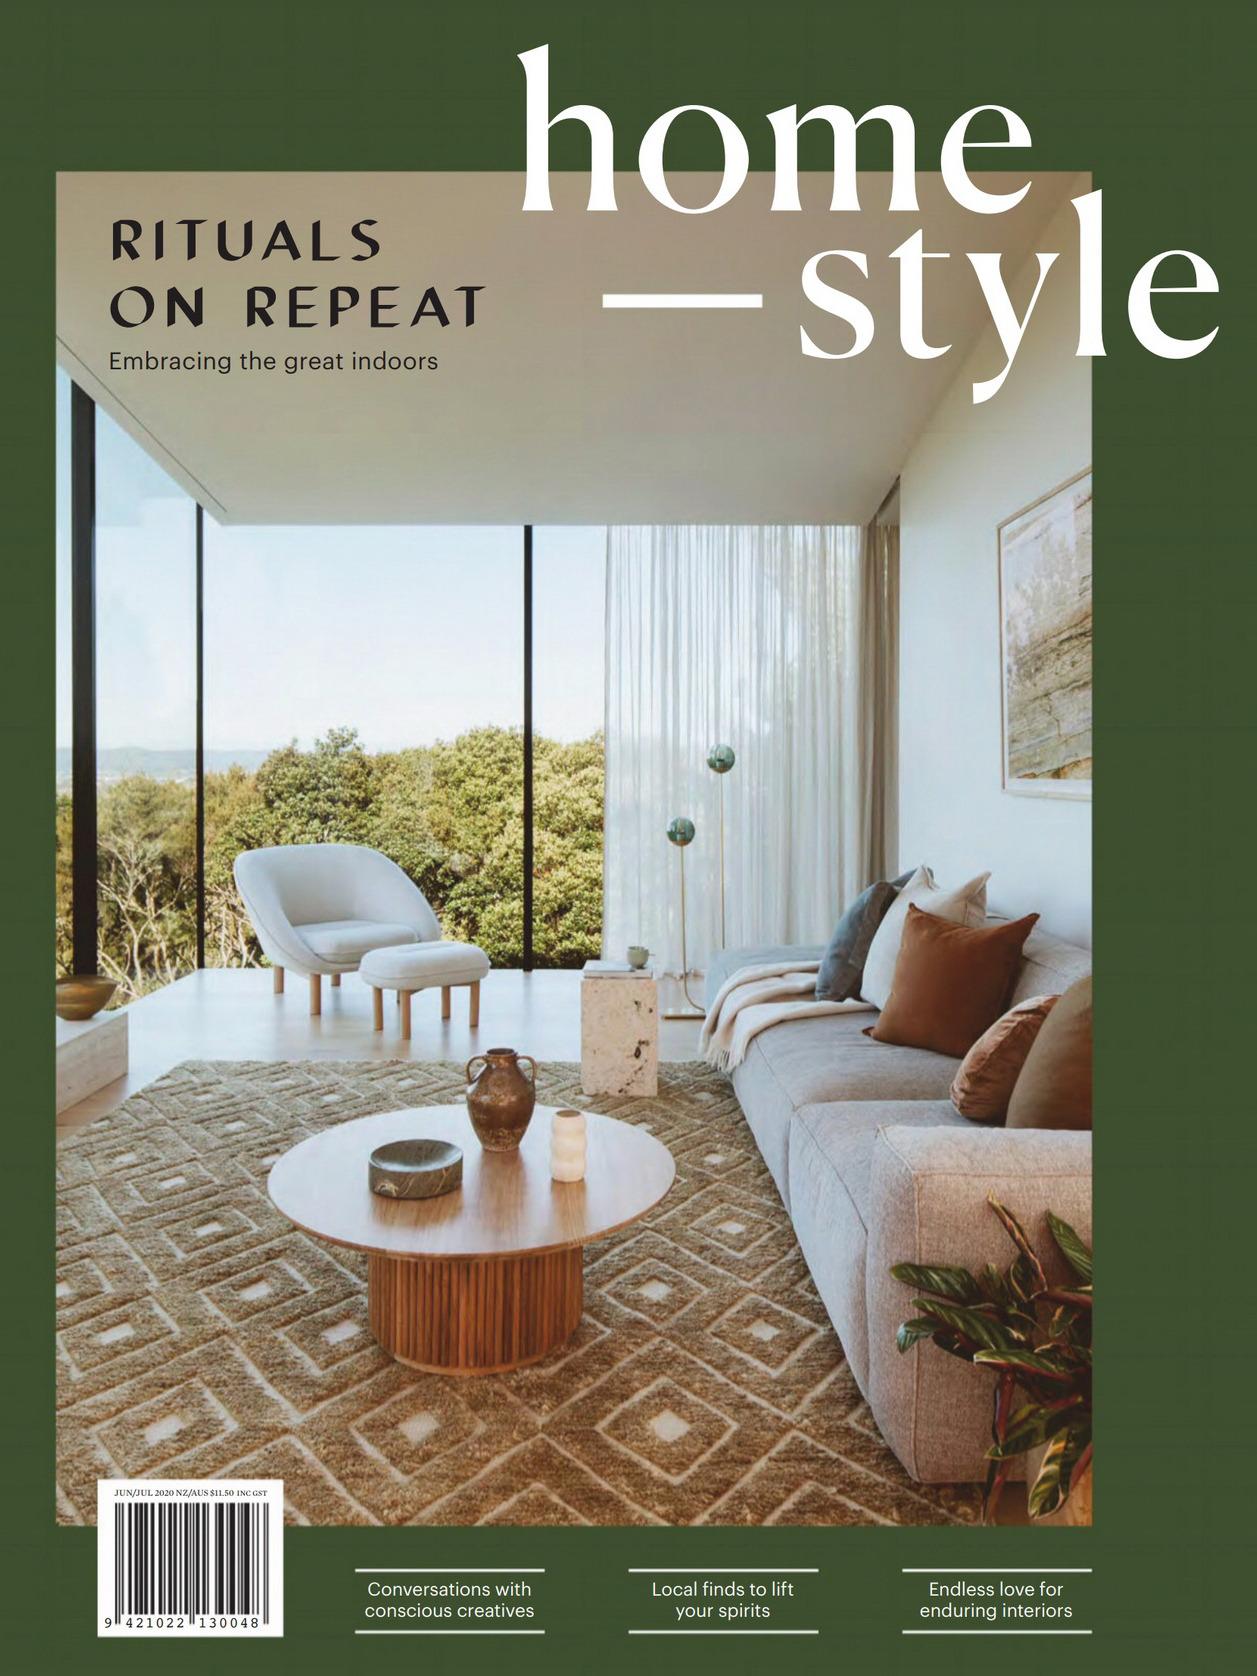 《Homestyle》新西兰室内装饰设计杂志2020年06-07月号